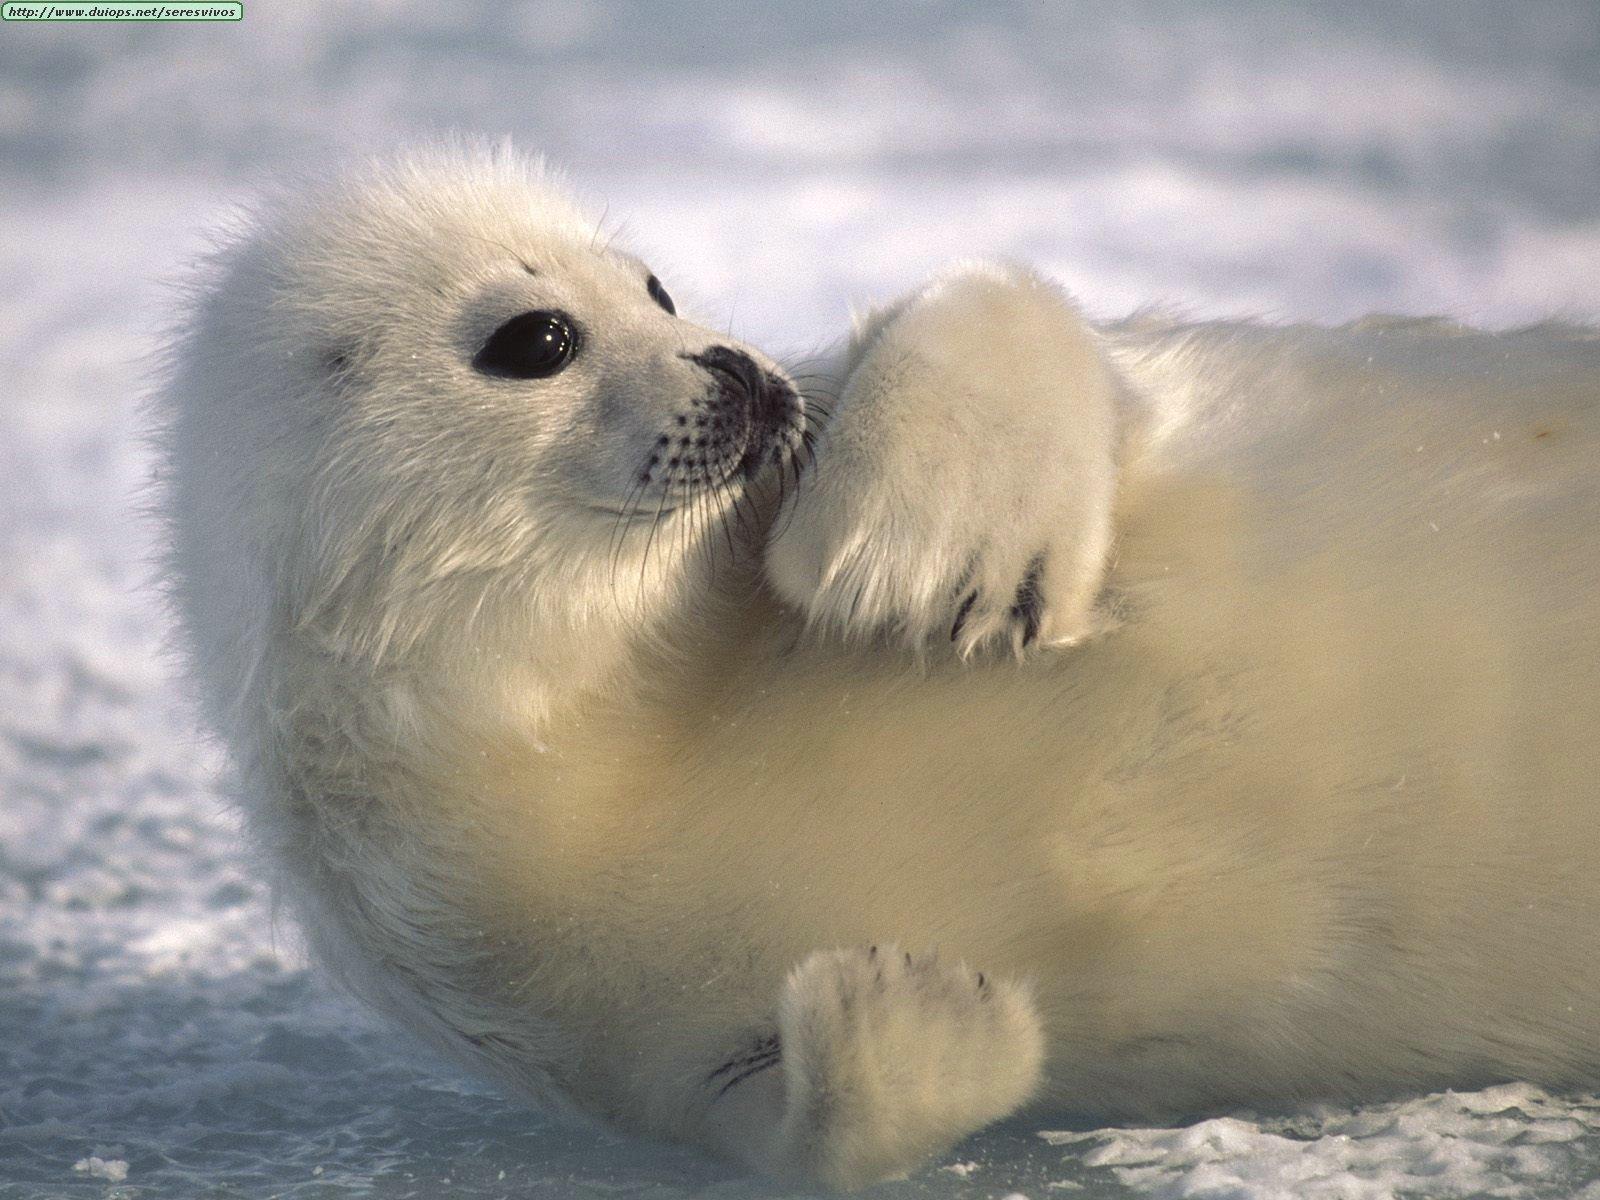 Cute Baby Harp Seal Edge Of The Plank: Cut...